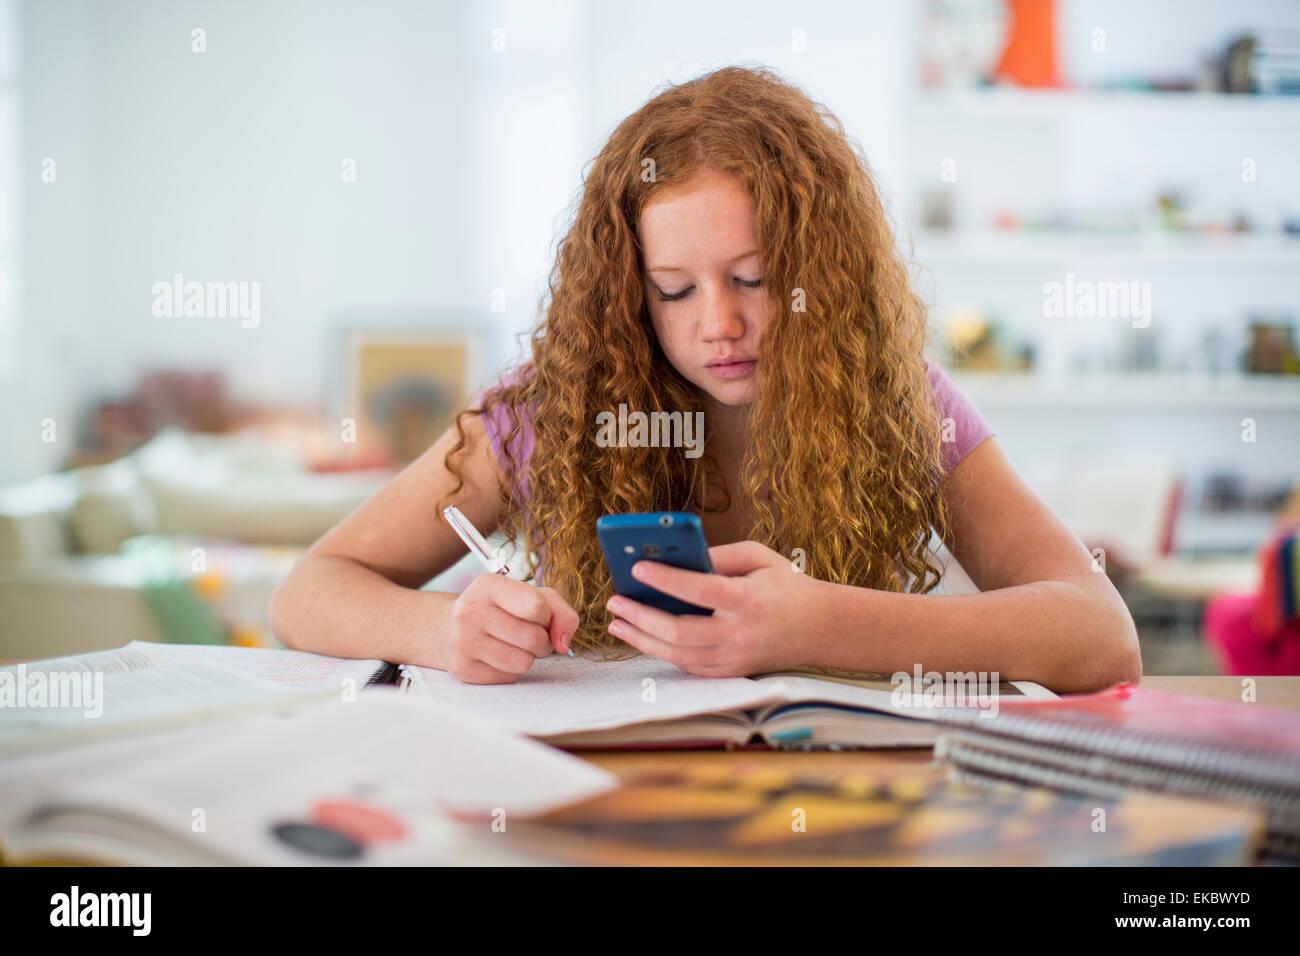 Teenage girl writing notes and using smartphone - Stock Image